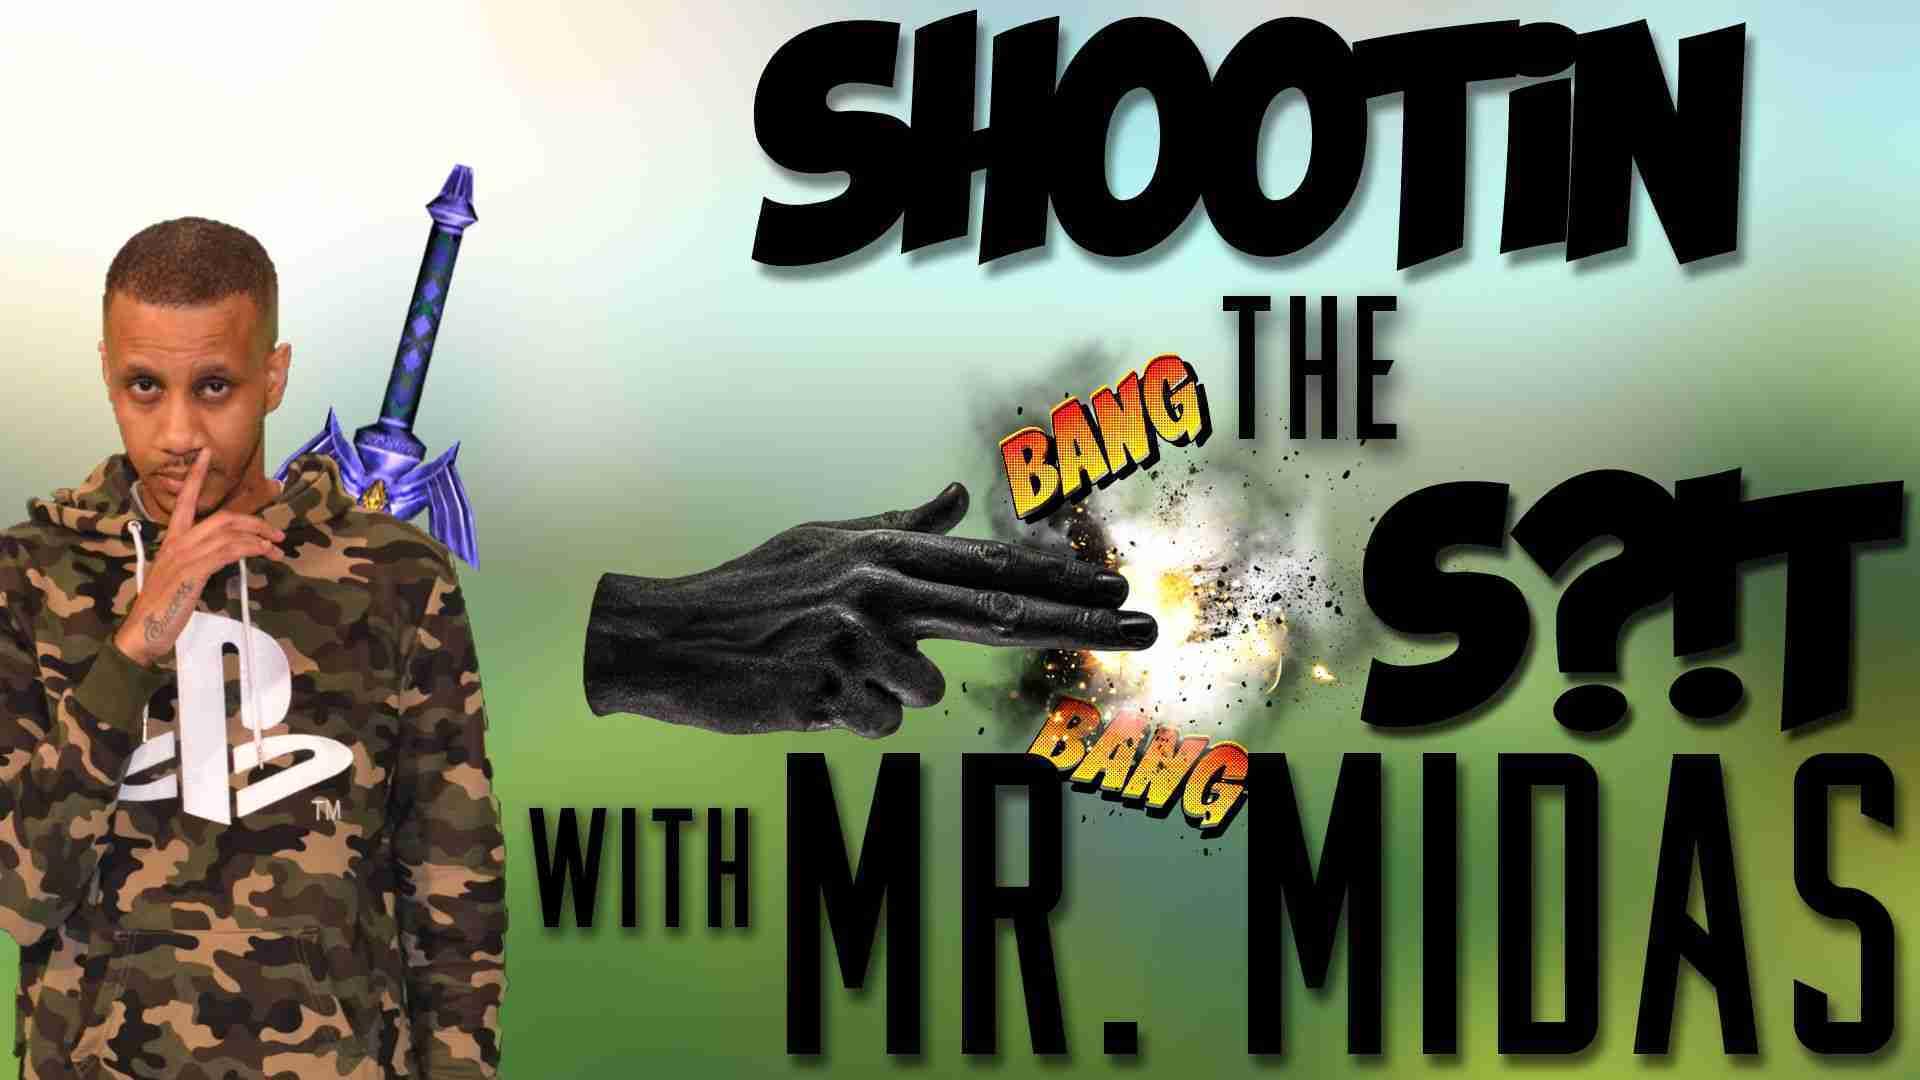 Mr. Midas